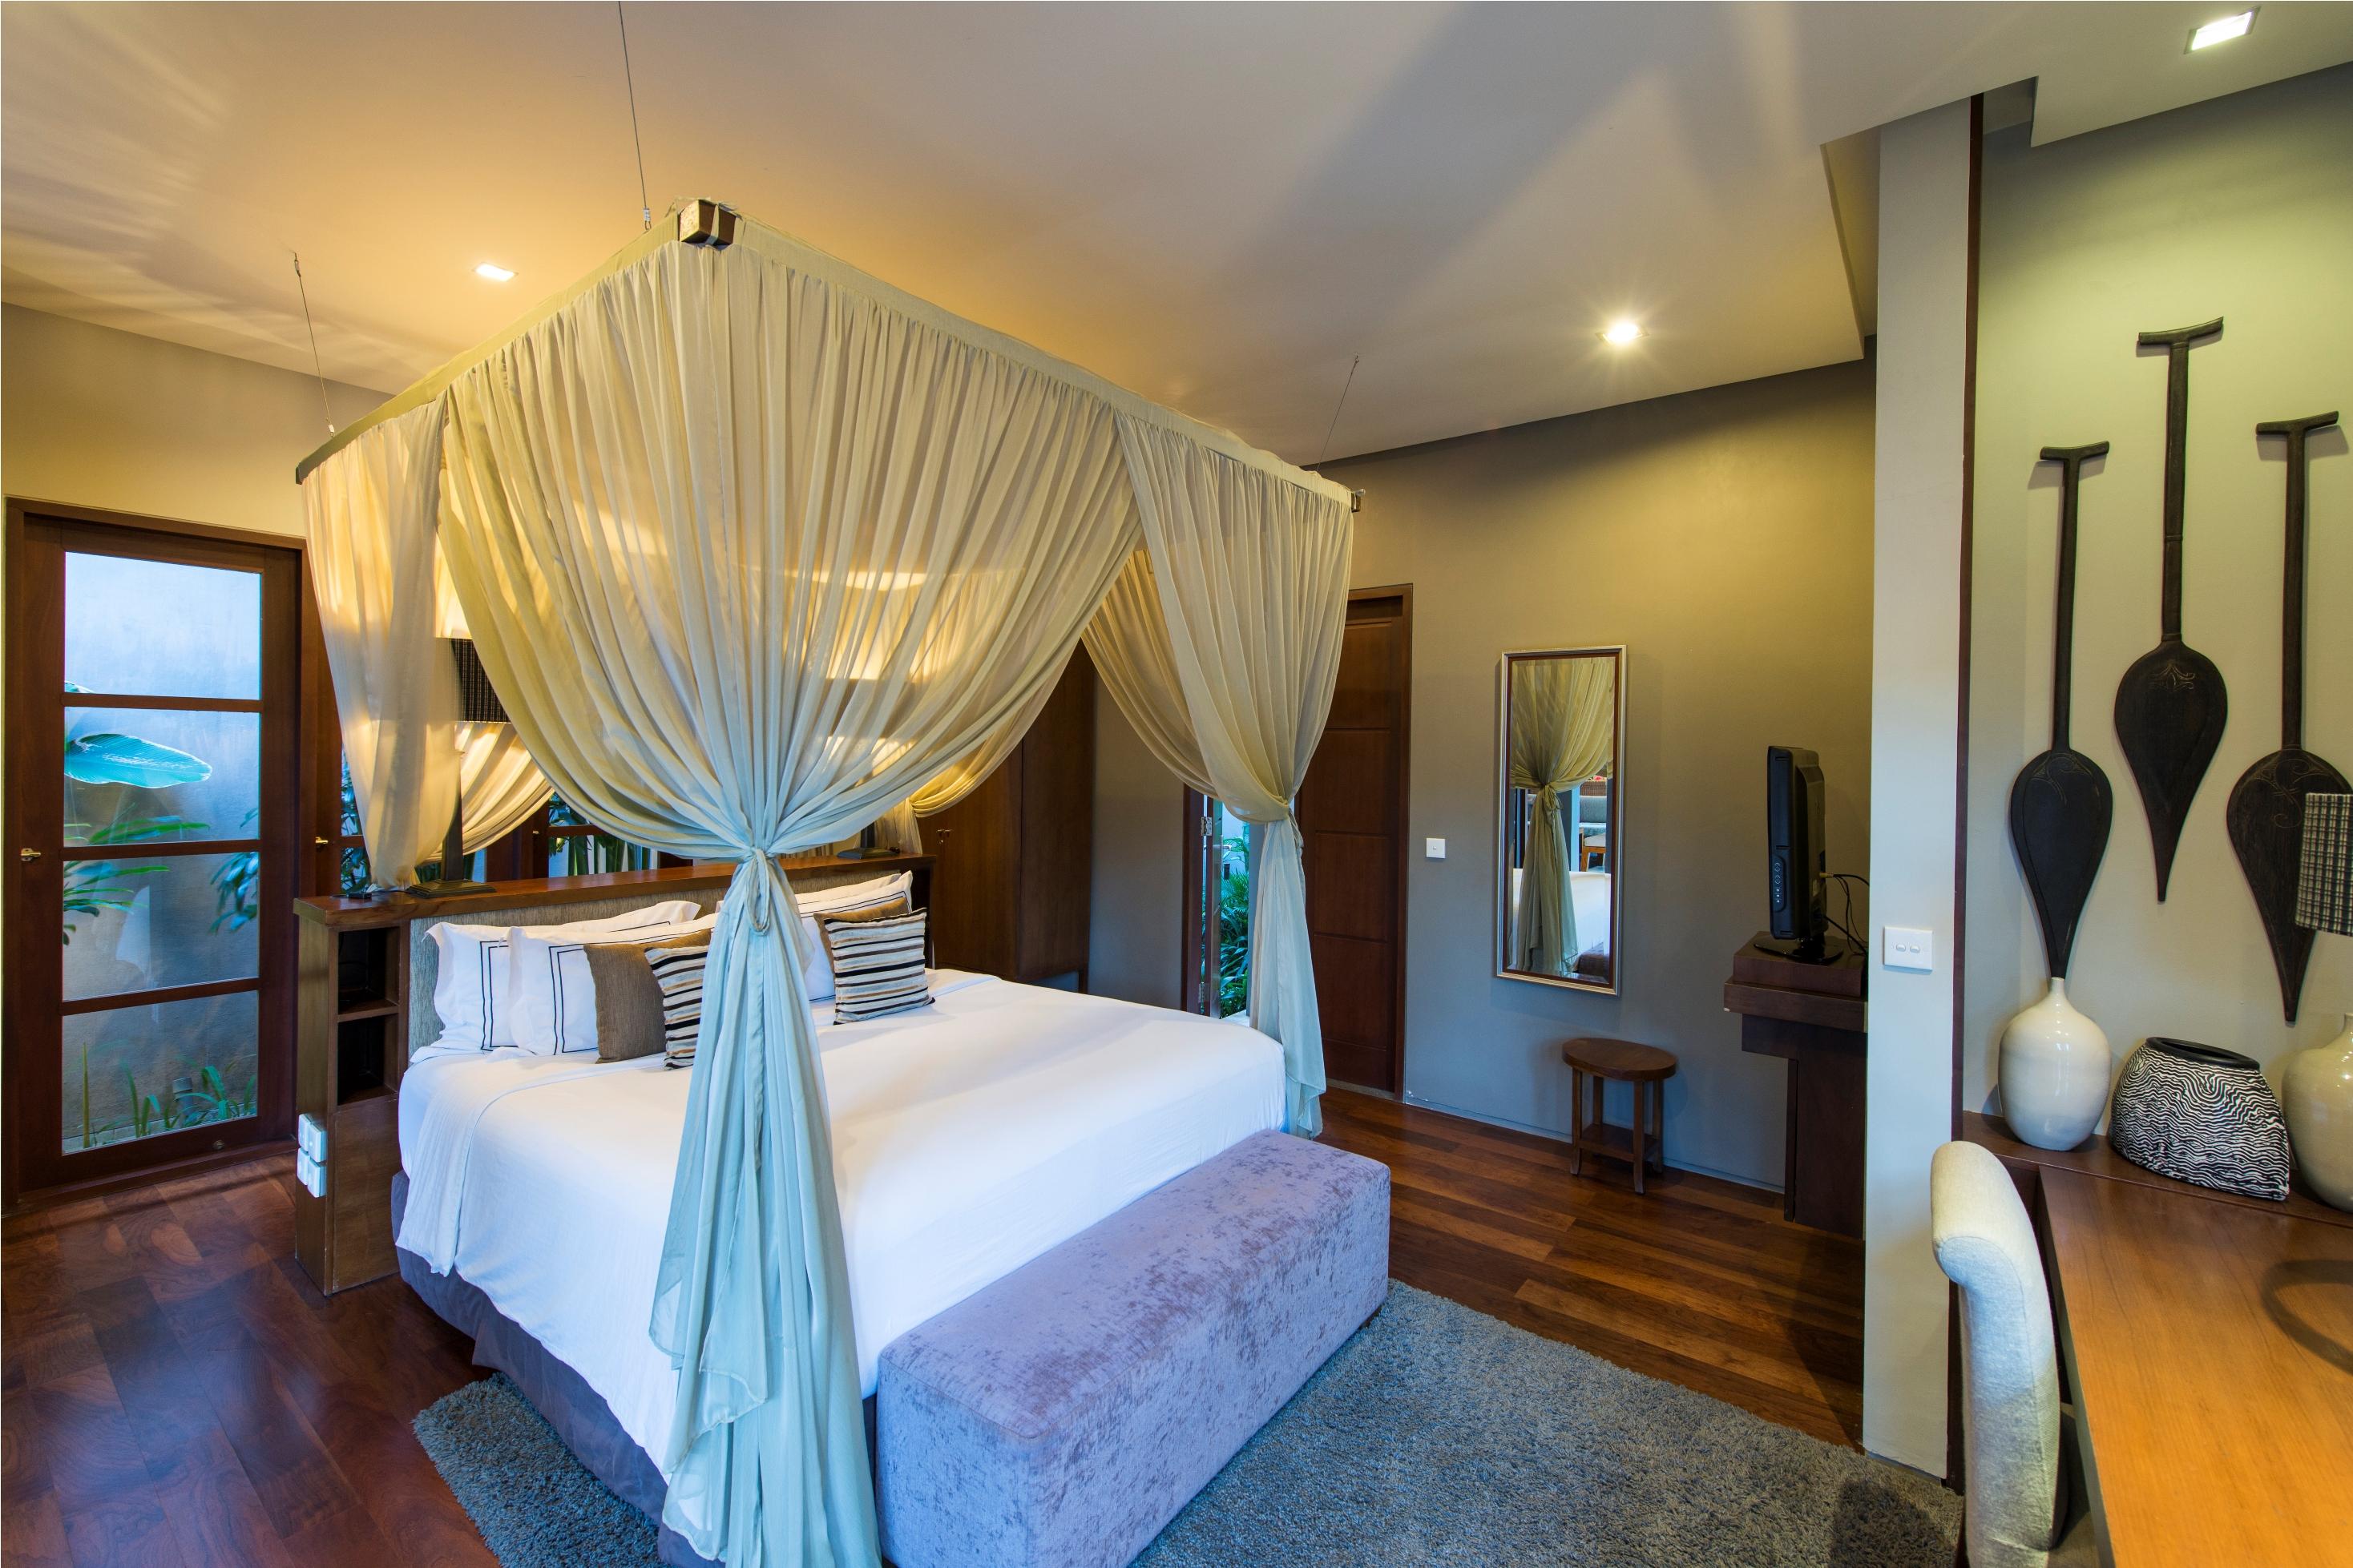 Bedroom master 3